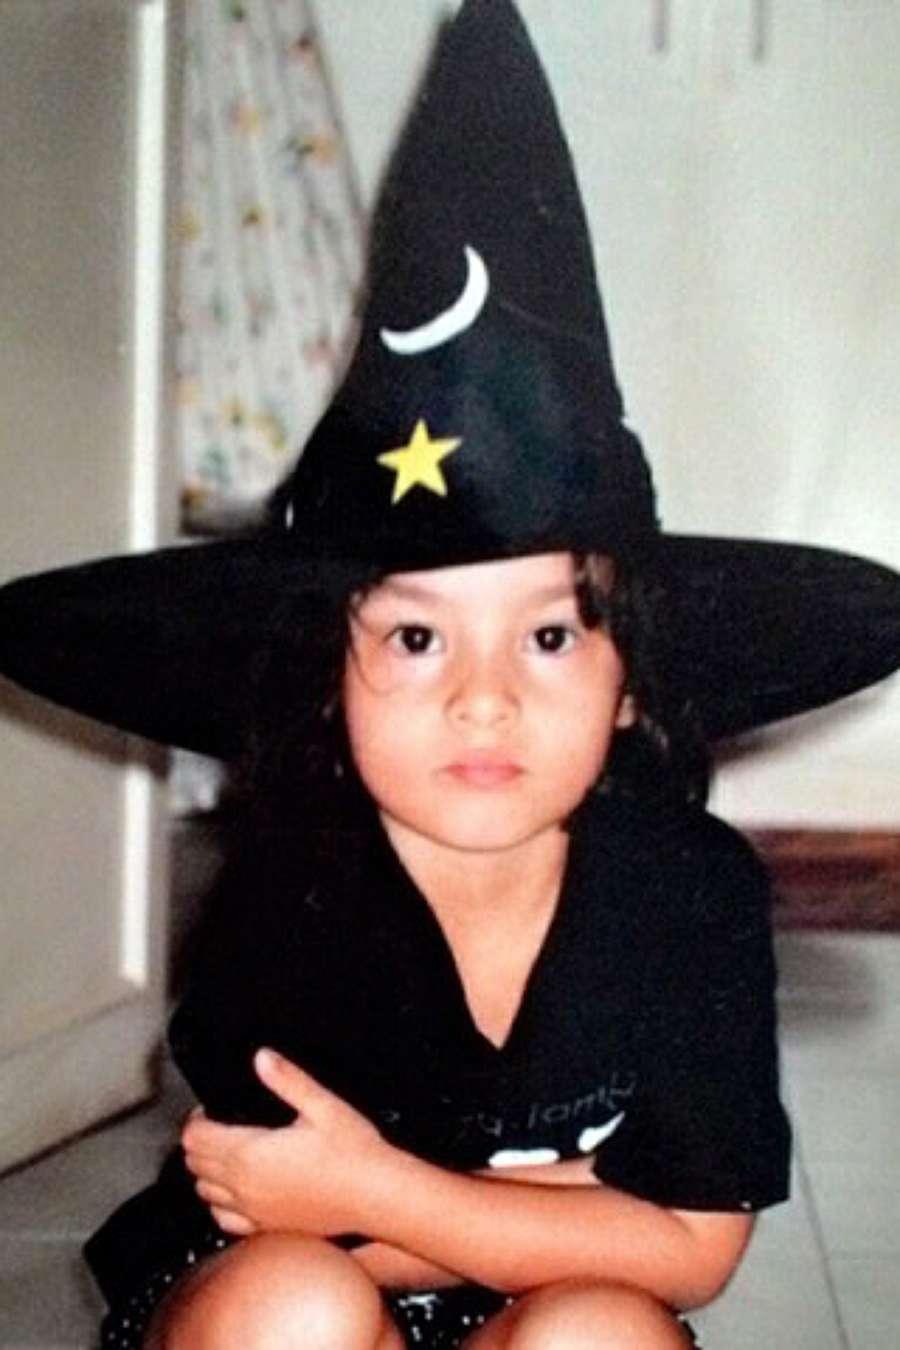 Intip Foto Foto Chelsea Islan Ketika Kecil Dulu Menggemaskan